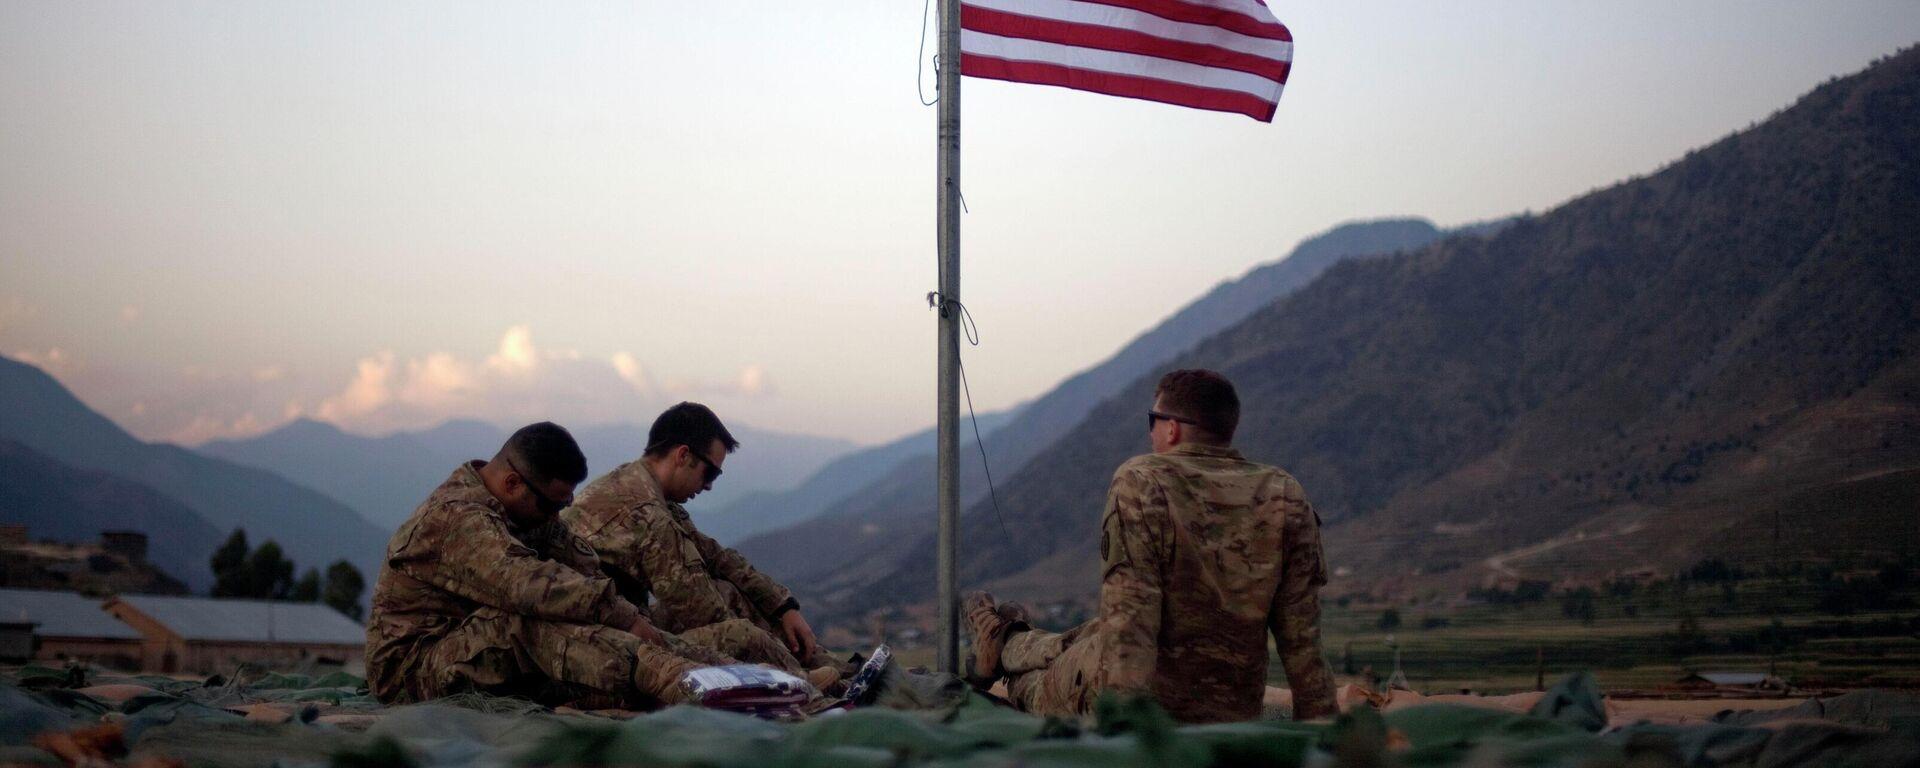 Militares de EEUU en Afganistán - Sputnik Mundo, 1920, 16.08.2021